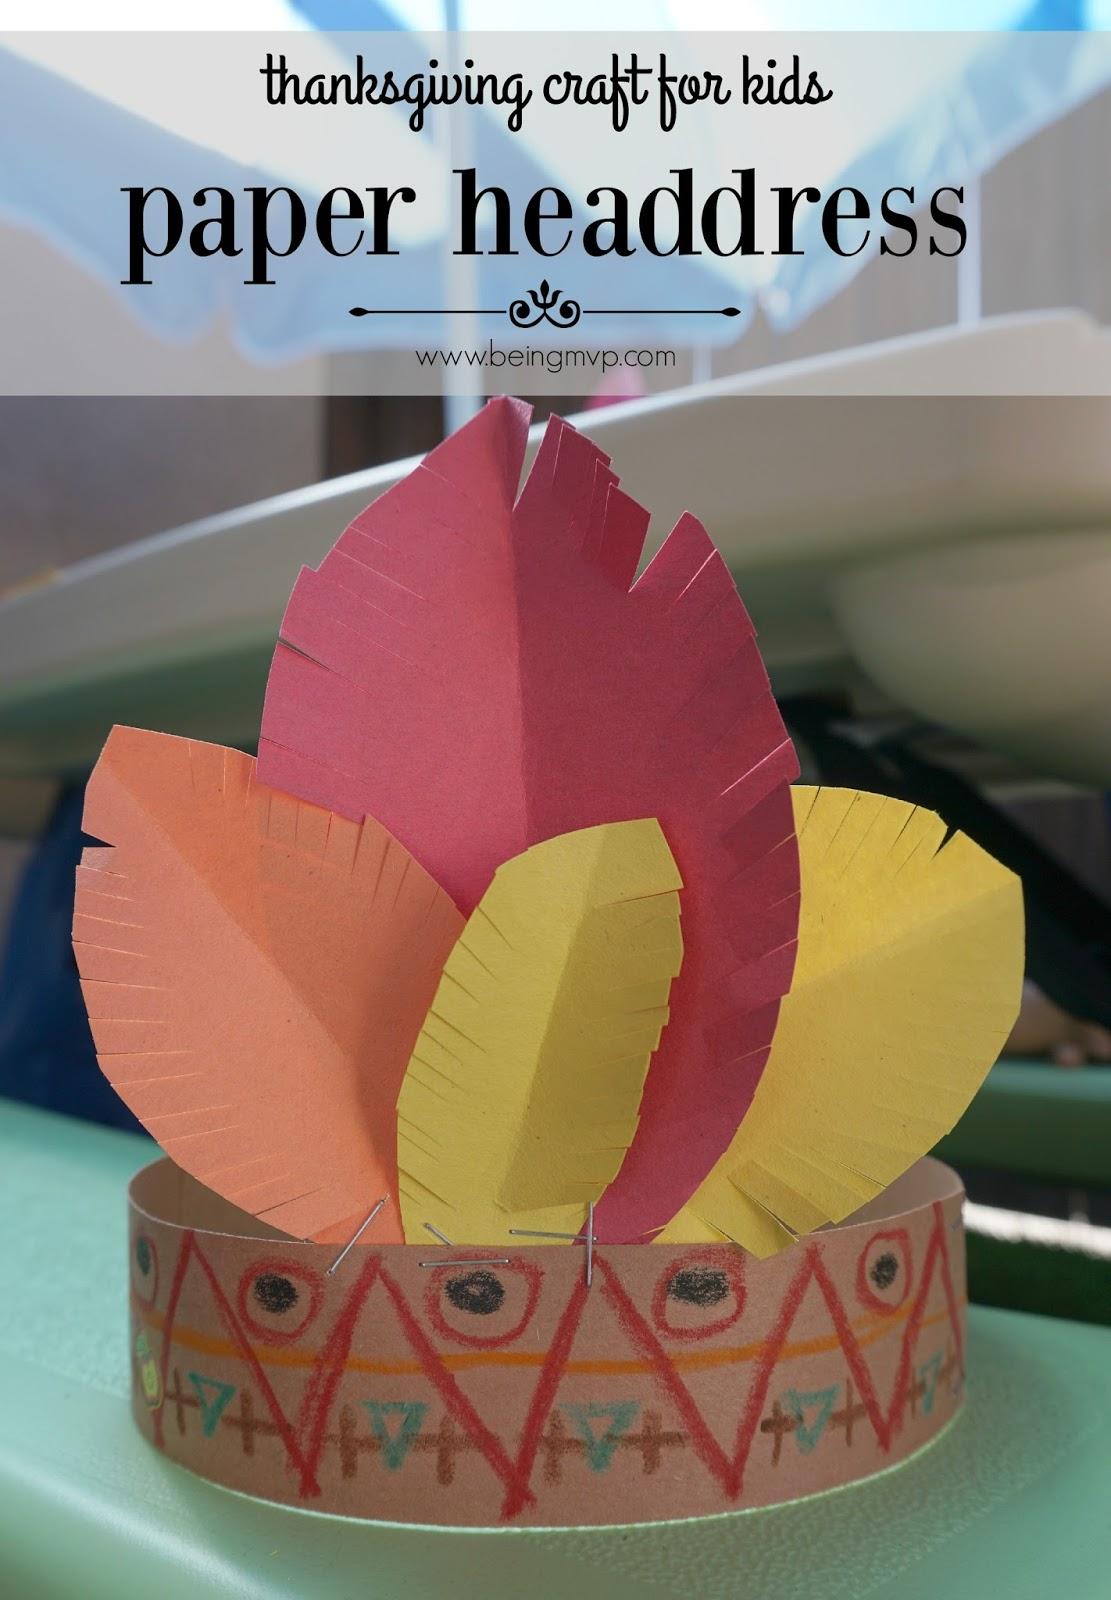 Being Mvp Thanksgiving Craft For Kids Paper Headdress